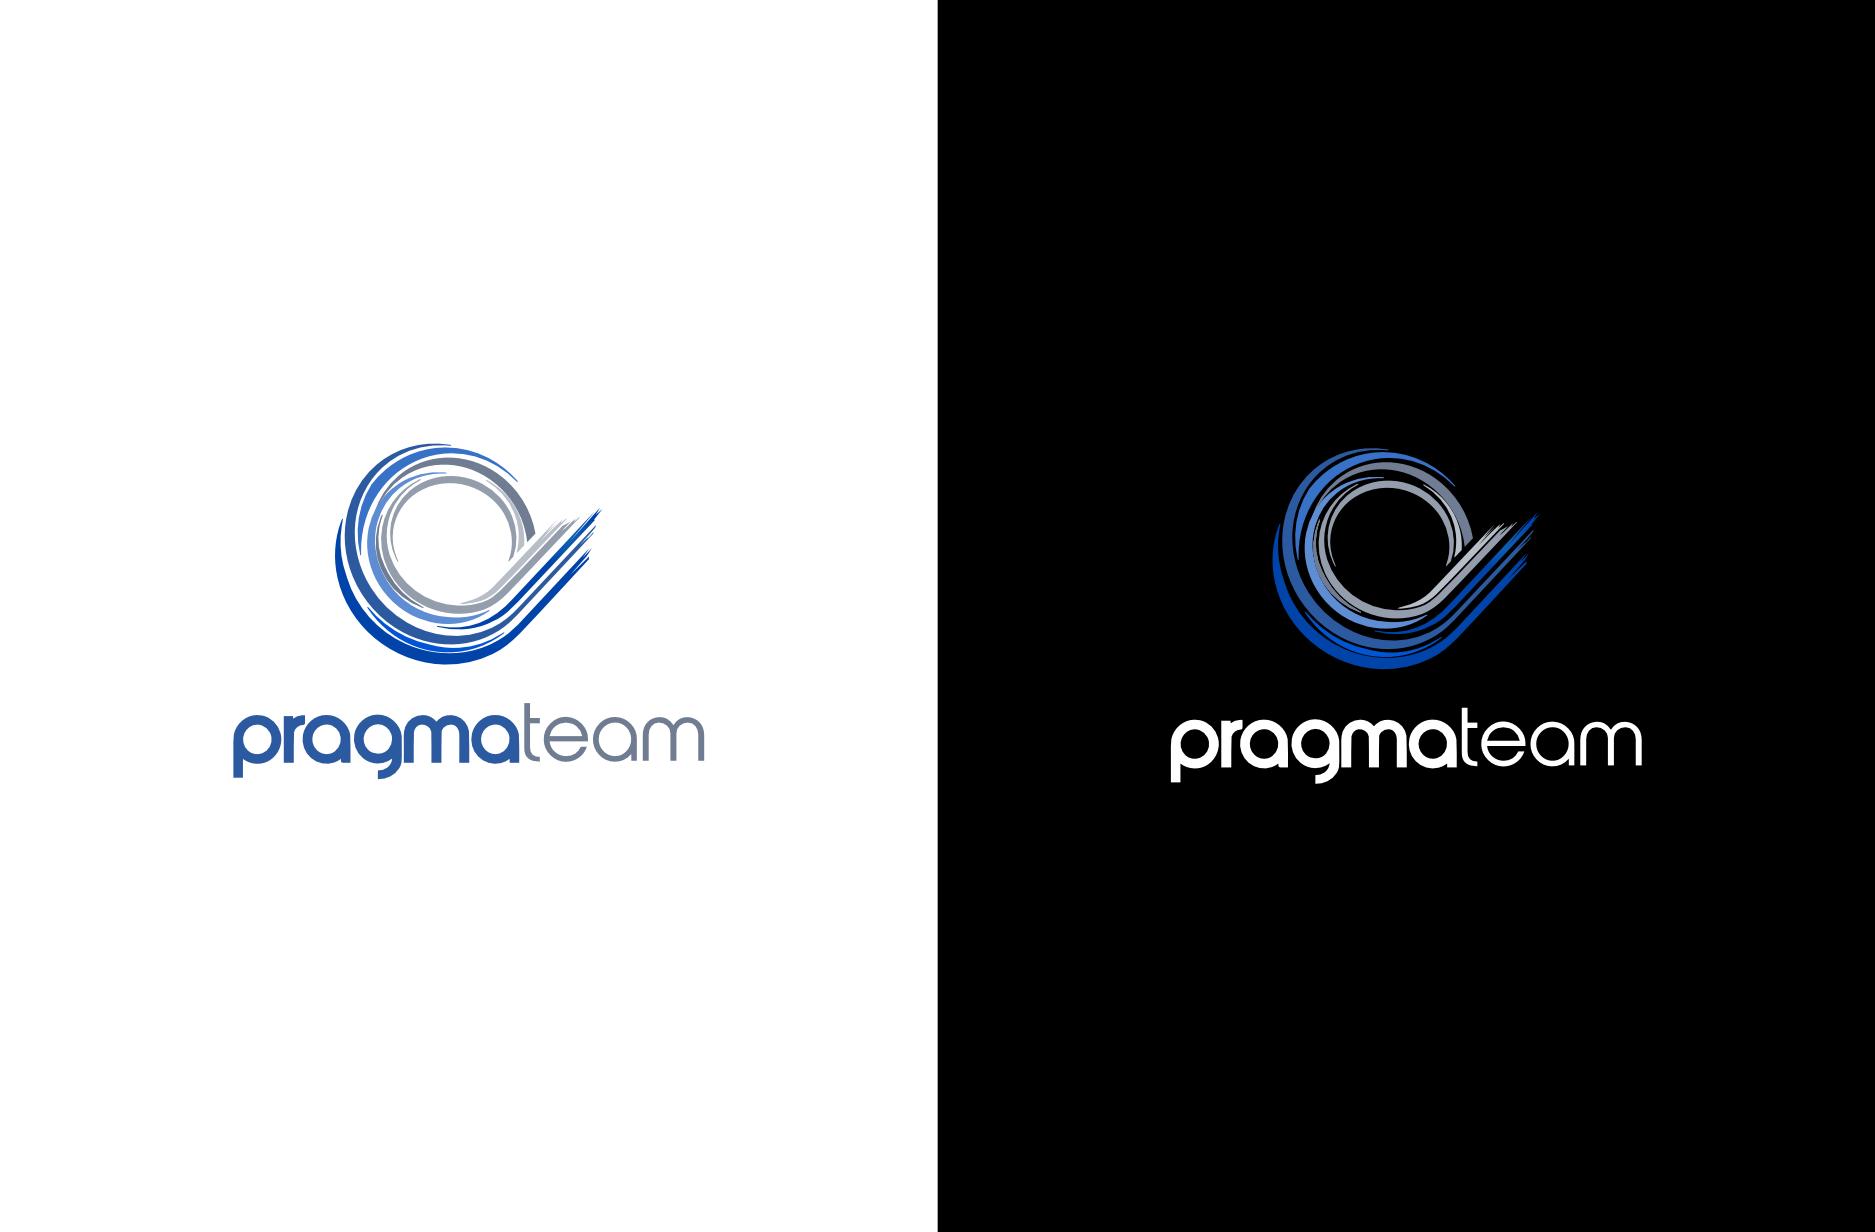 Create a logo for pragmateam